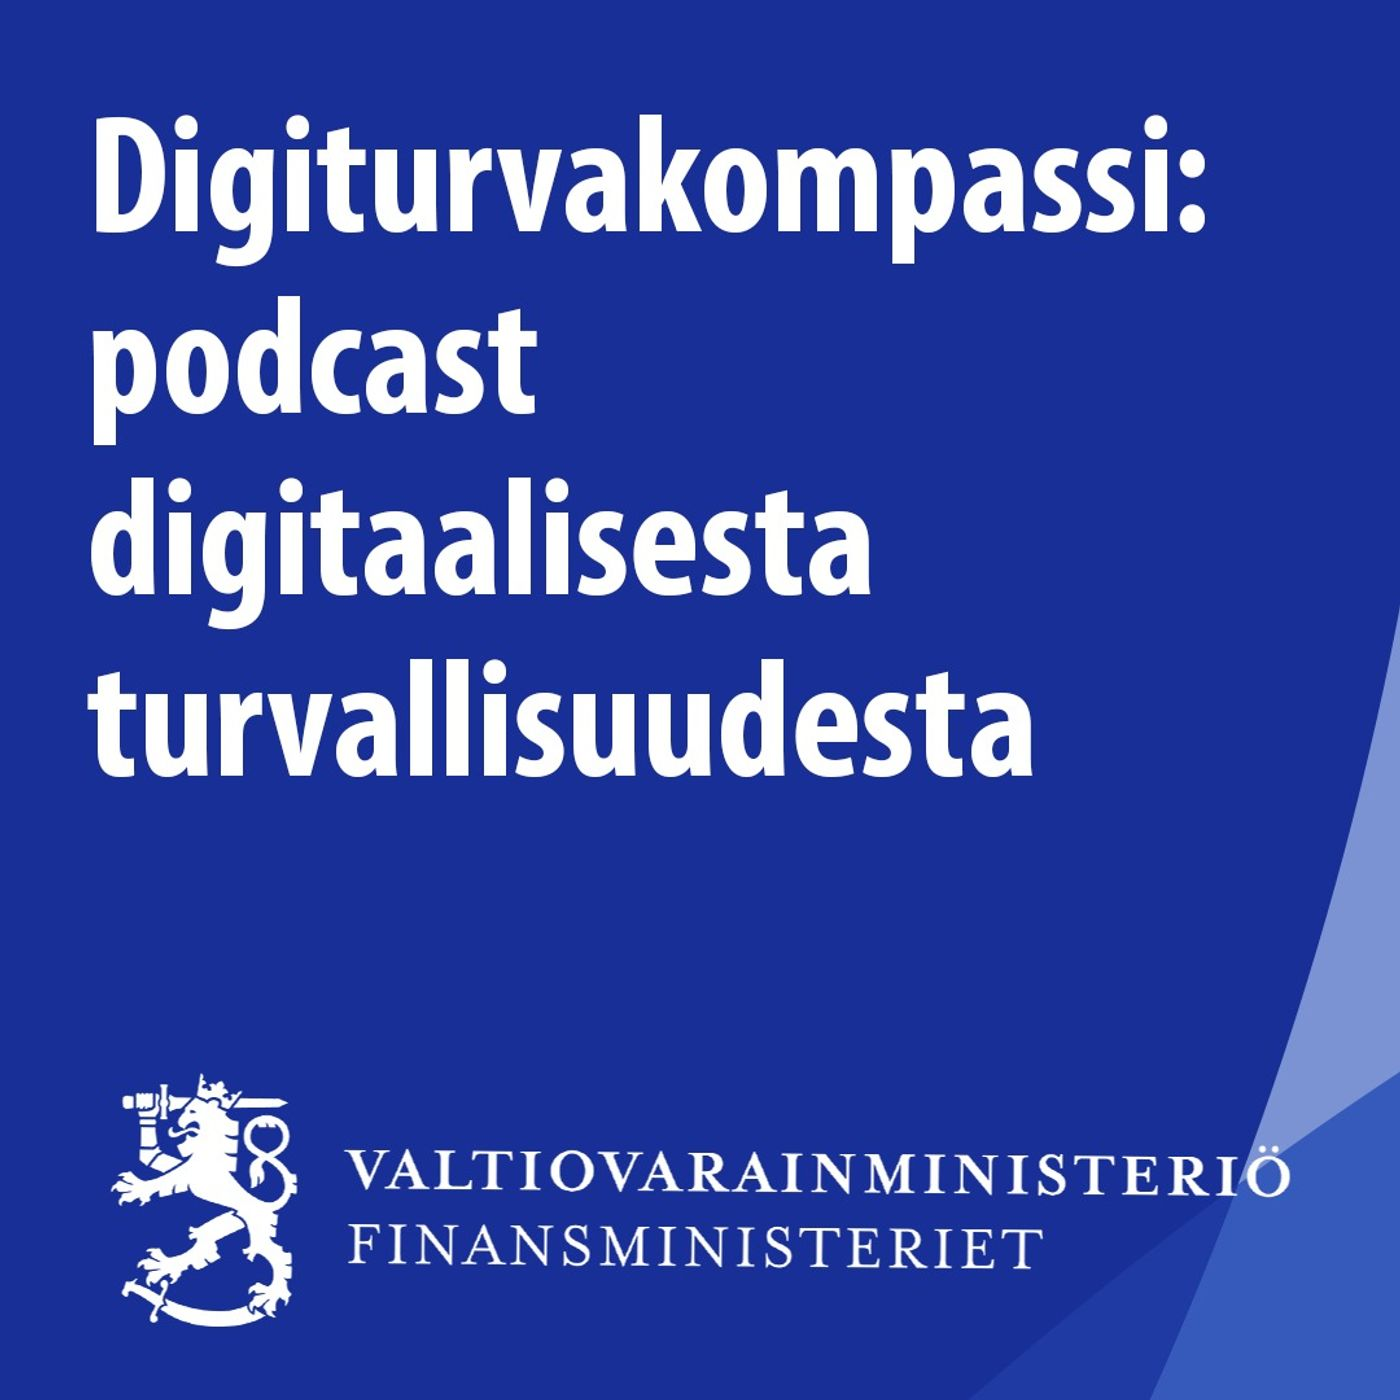 Digiturvakompassi-podcast